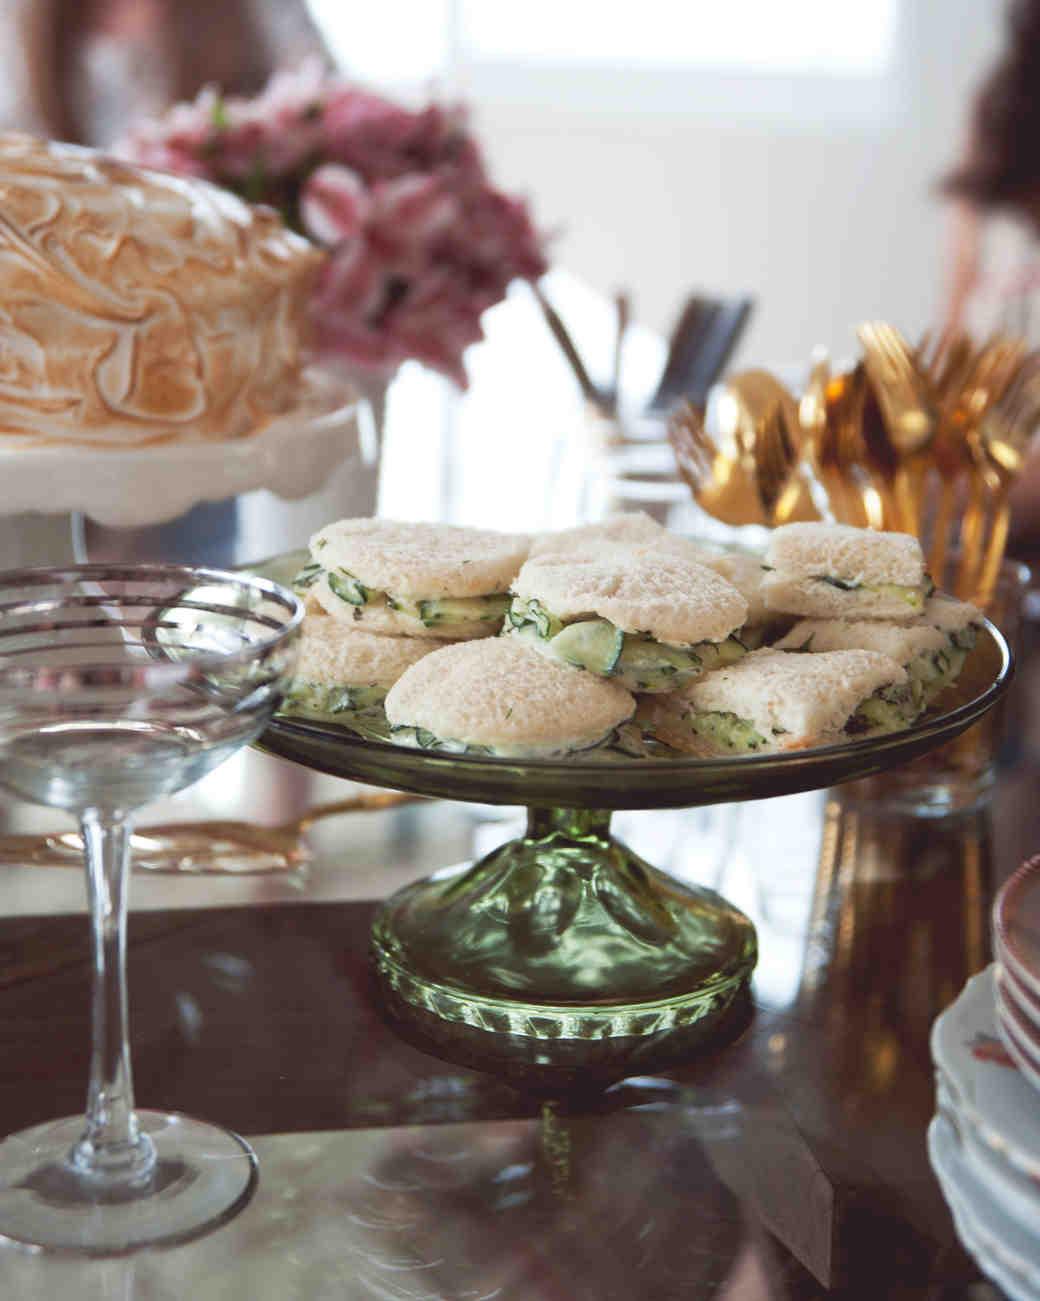 claire-thomas-bridal-shower-vintage-sandwiches-0814.jpg